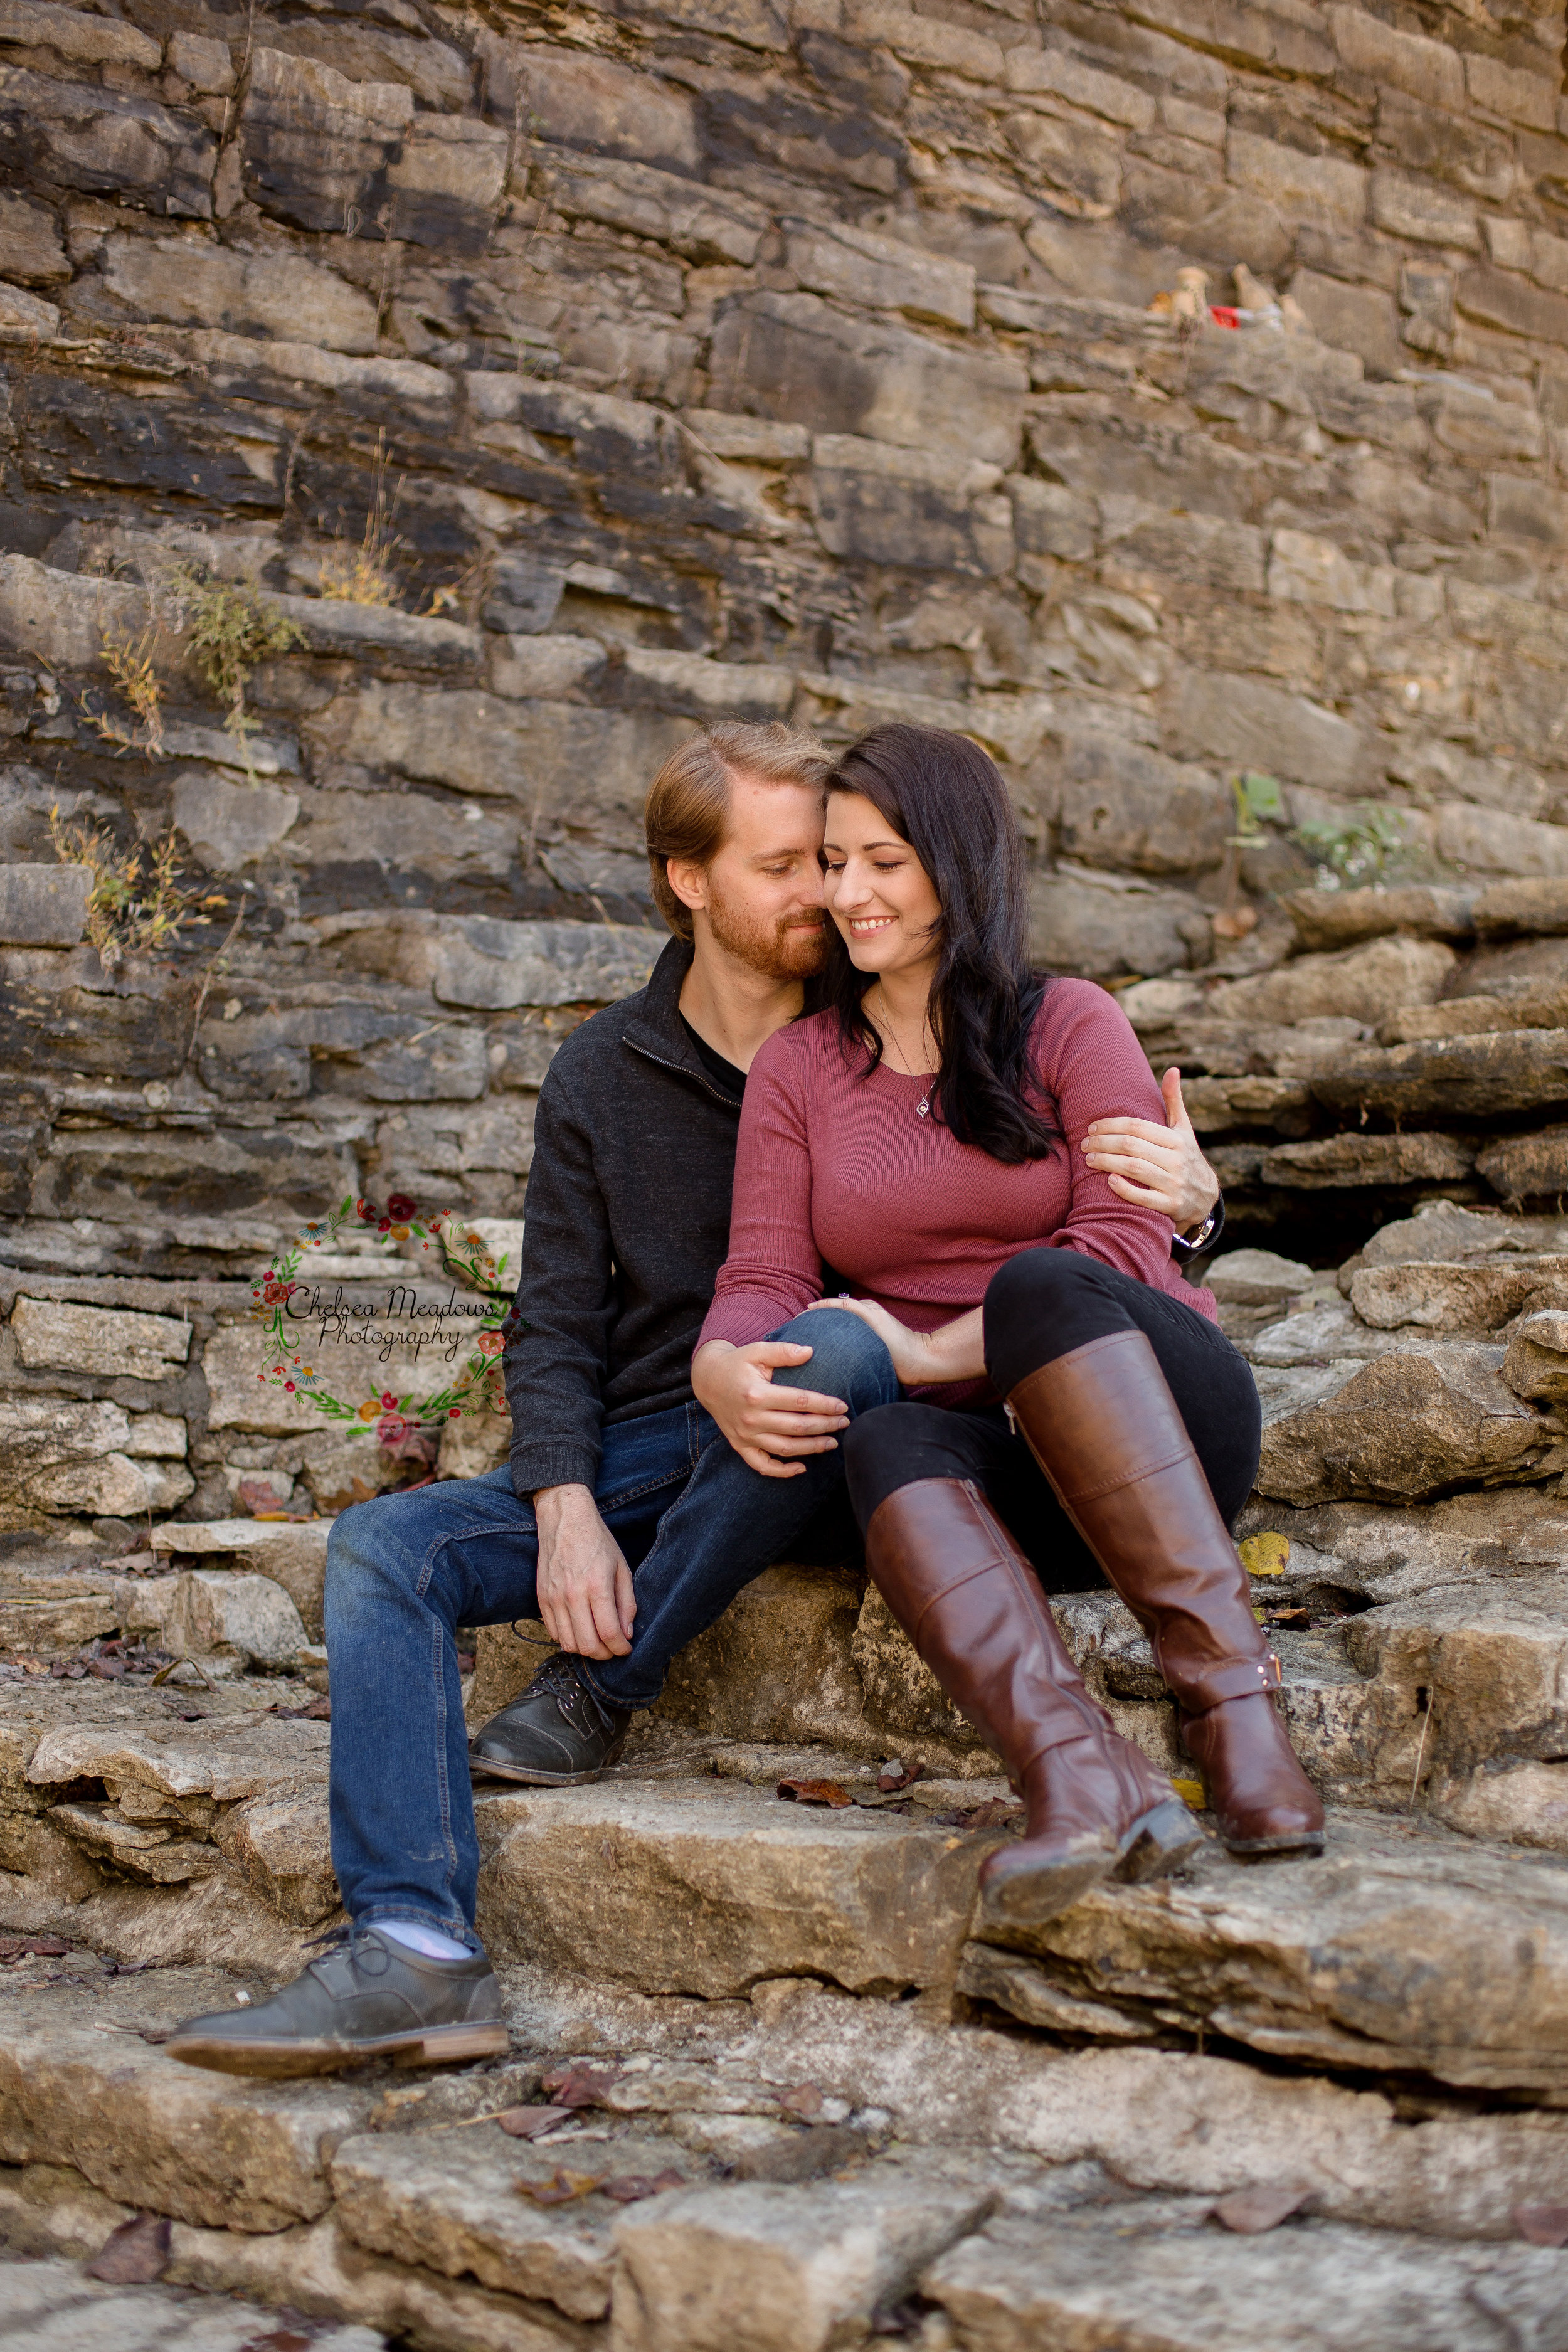 Kassie & Josh Engagement - Nashville Couple Photographer - Chelsea Meadows Photography (30).jpg